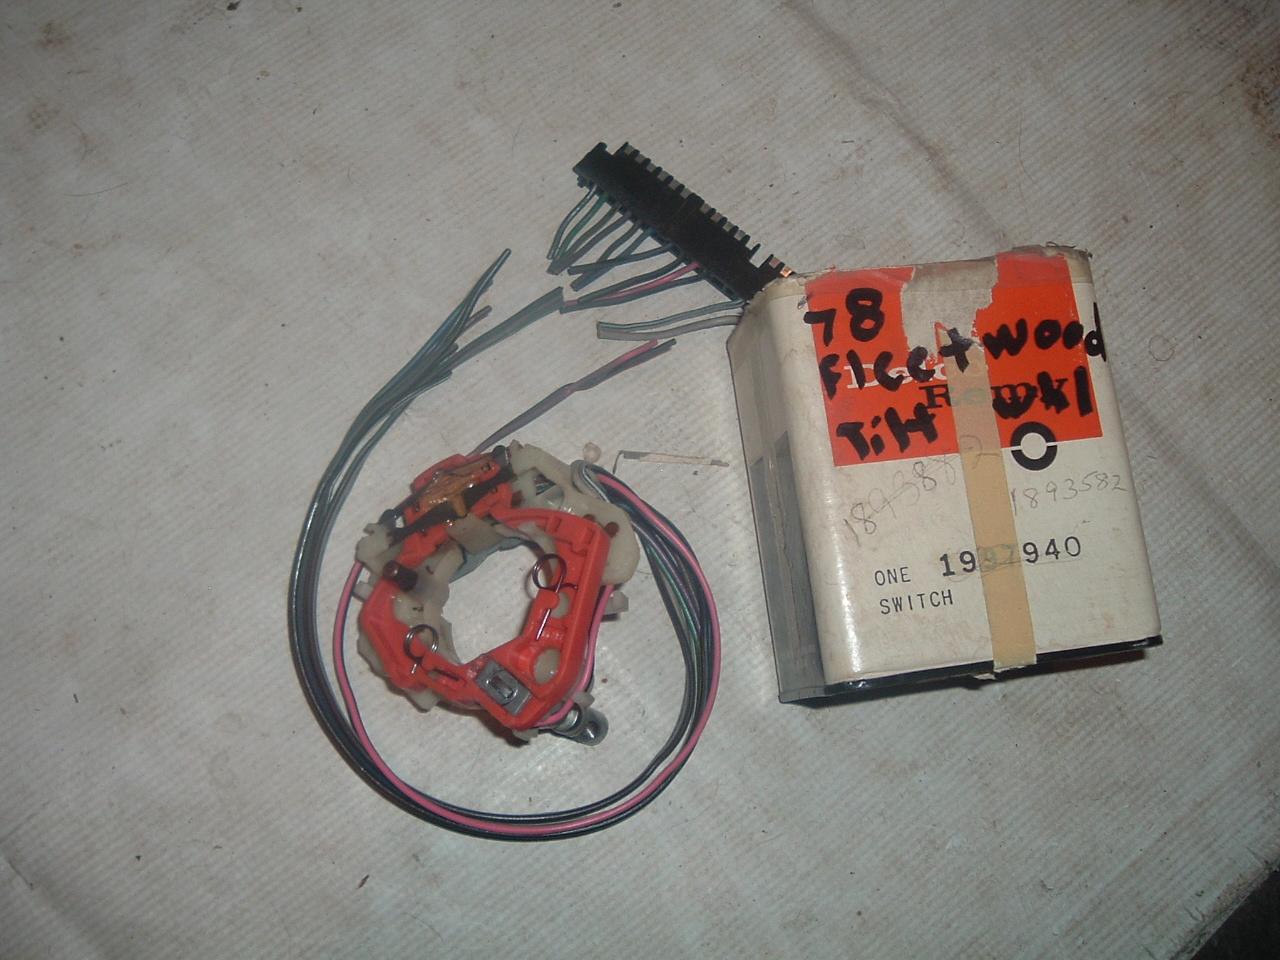 1969 70 71 72 73 74 75 cadillac turn signal switch tilt /teli 1997940 (1)